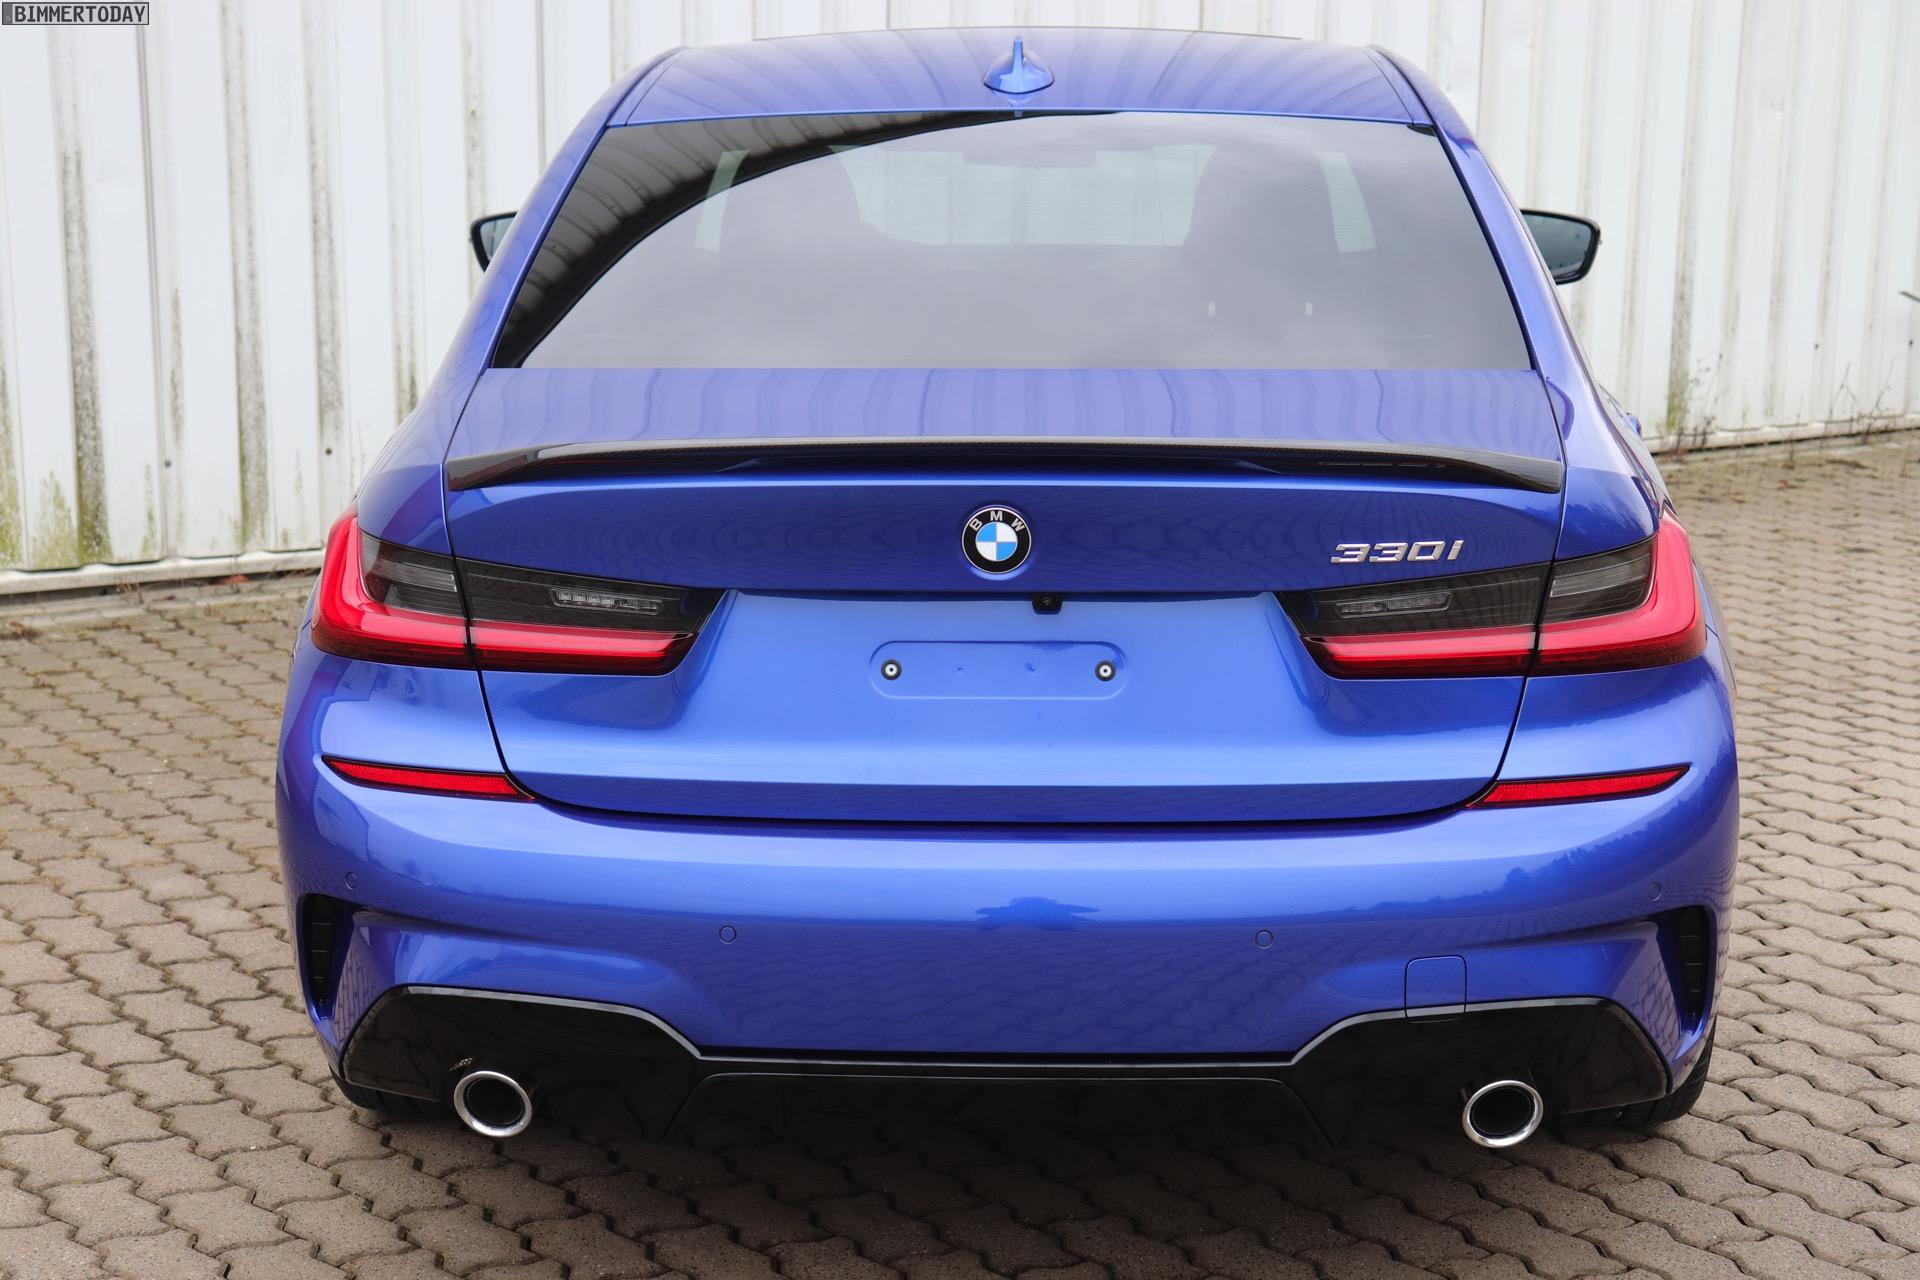 Name:  2019-BMW-330i-G20-M-Performance-Parts-1.jpg2019-BMW-330i-G20-M-Performance-Parts-1.jpg2019-BMW-3.jpg Views: 3916 Size:  455.8 KB